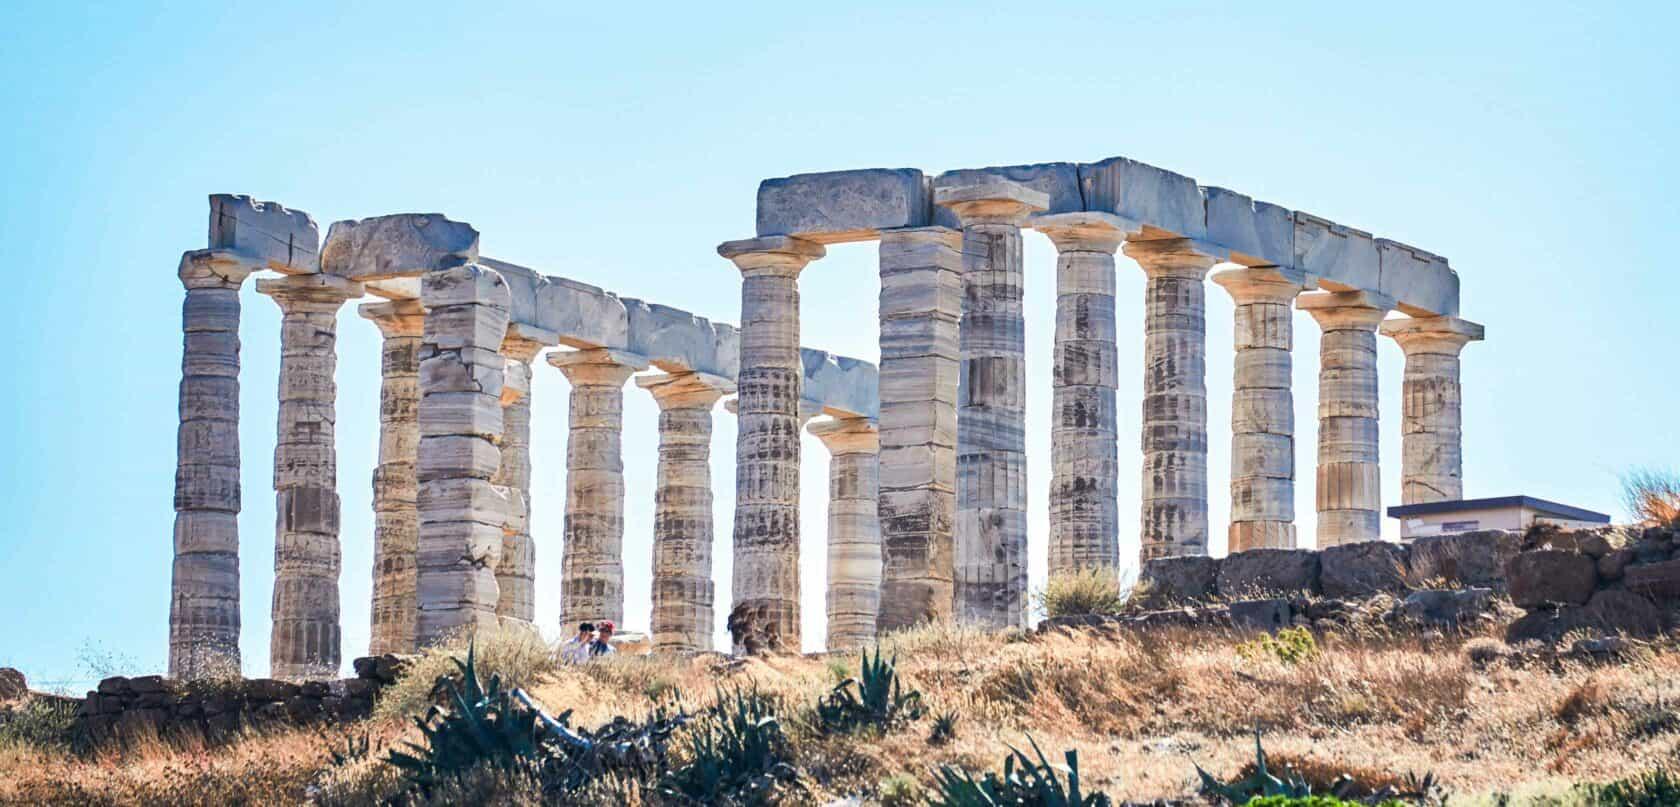 Greek columns in Athens, Greece.